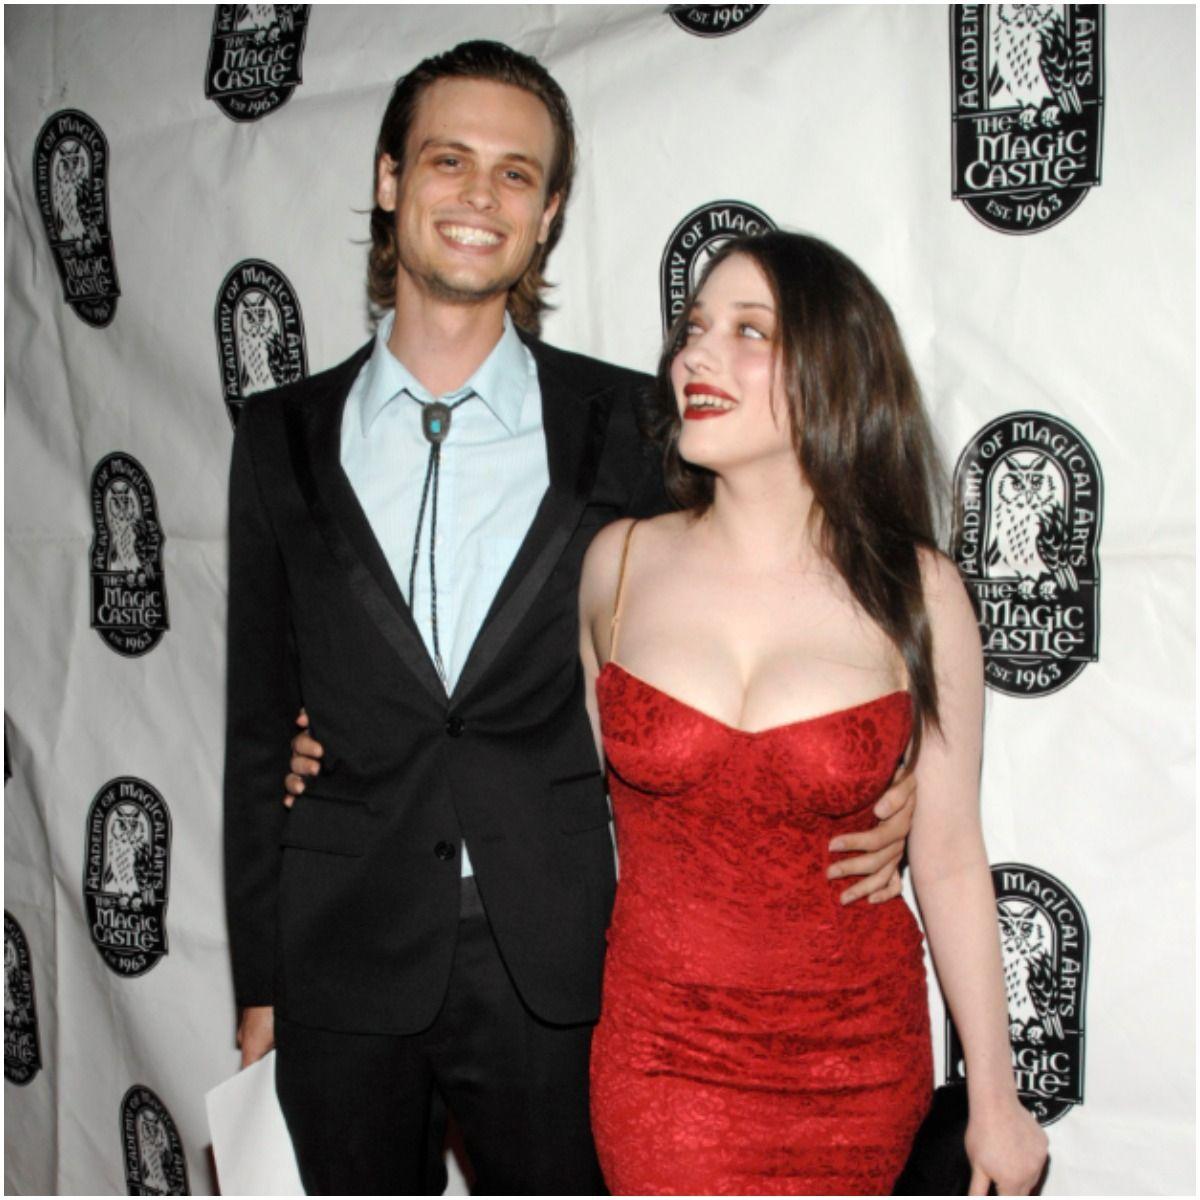 Matthew Gray Gubler and his girlfriend Kat Dennings